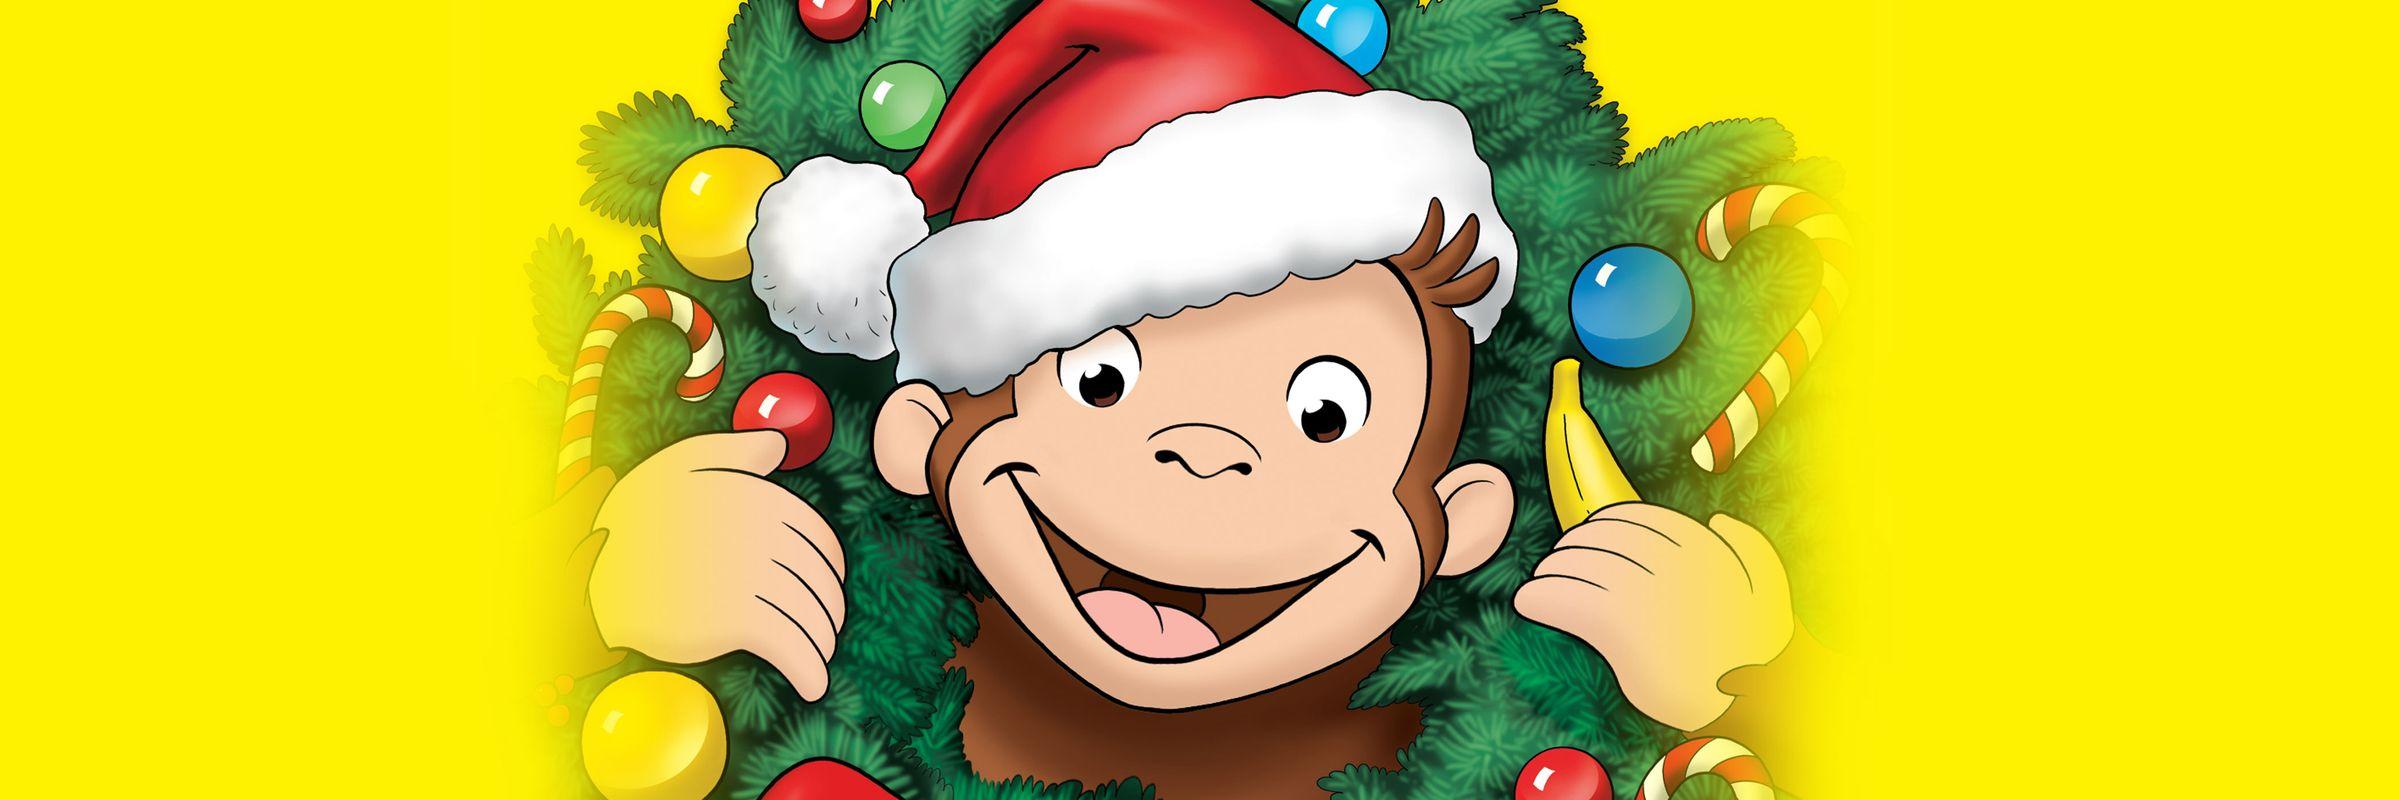 Curious George Christmas.Curious George A Very Monkey Christmas Full Movie